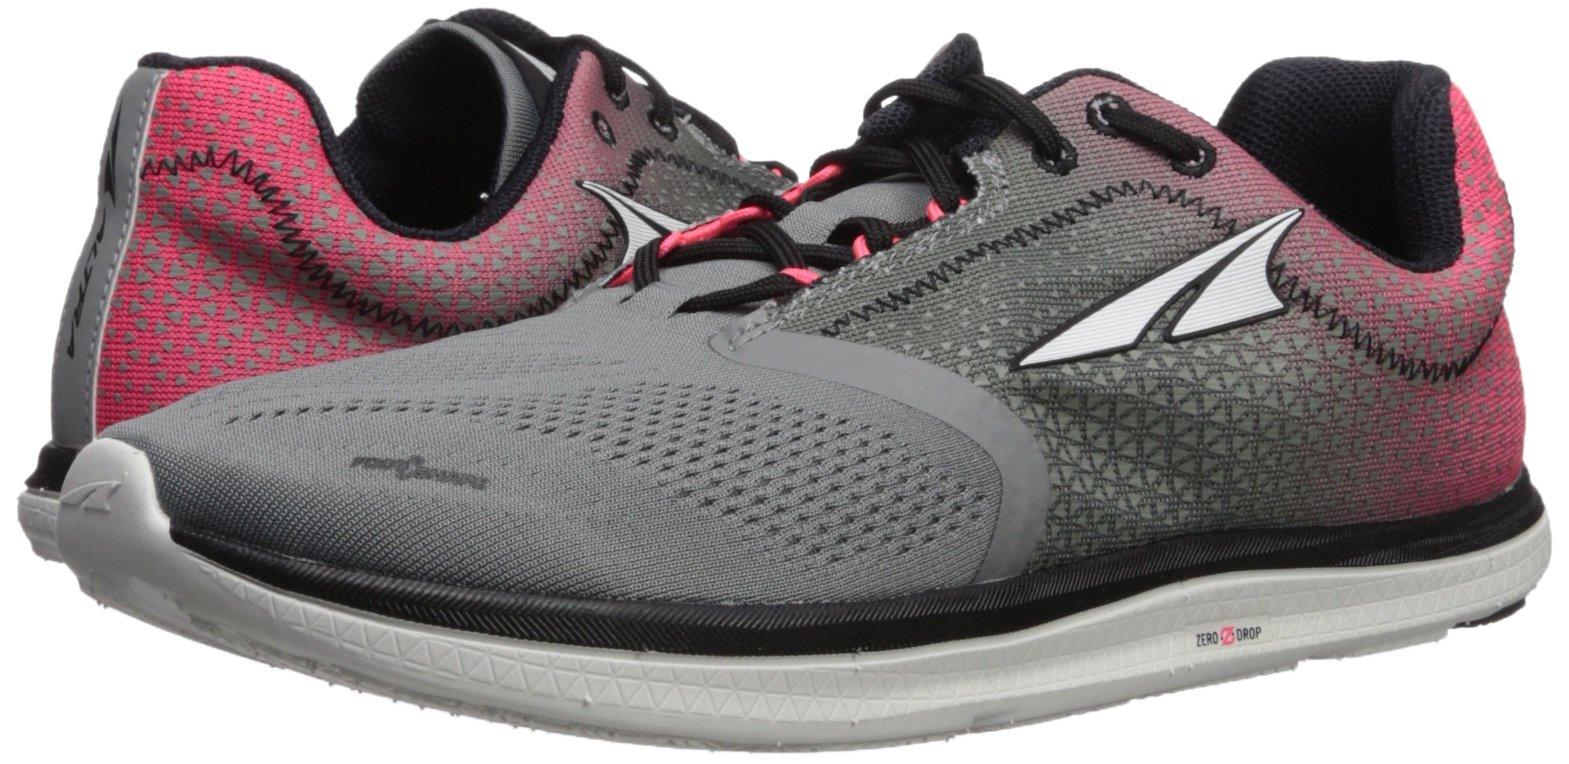 Altra Men's Solstice Sneaker Pink/Gray 7 Regular US by Altra (Image #5)